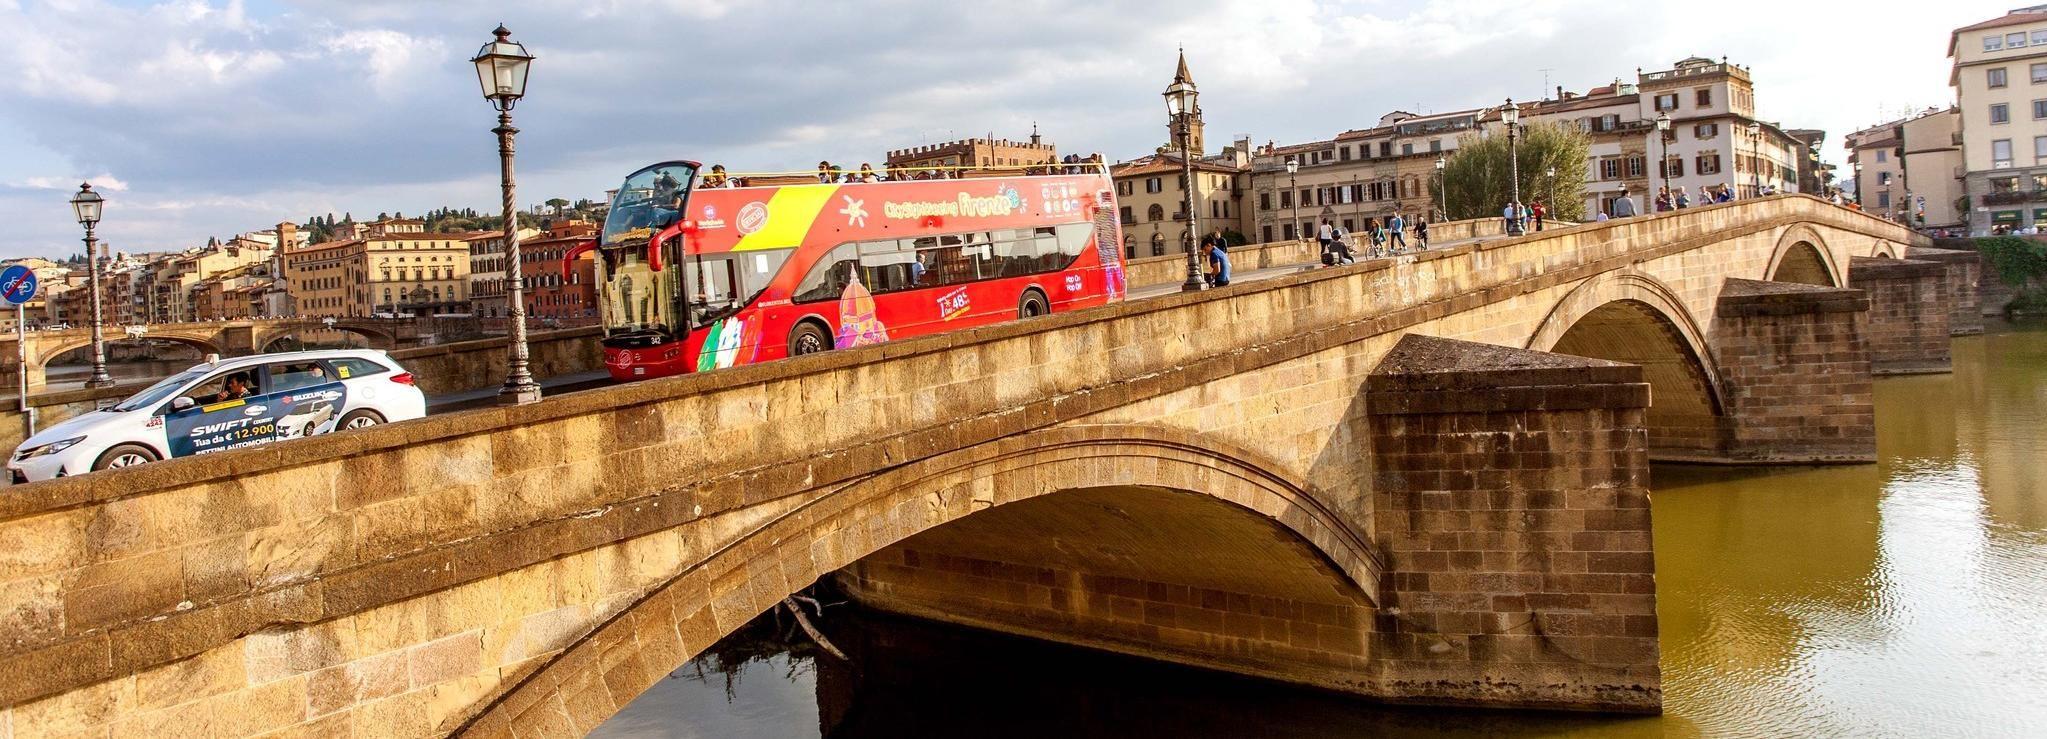 Hop on, hop off-bustour Florence: ticket 24, 48 of 72 uur